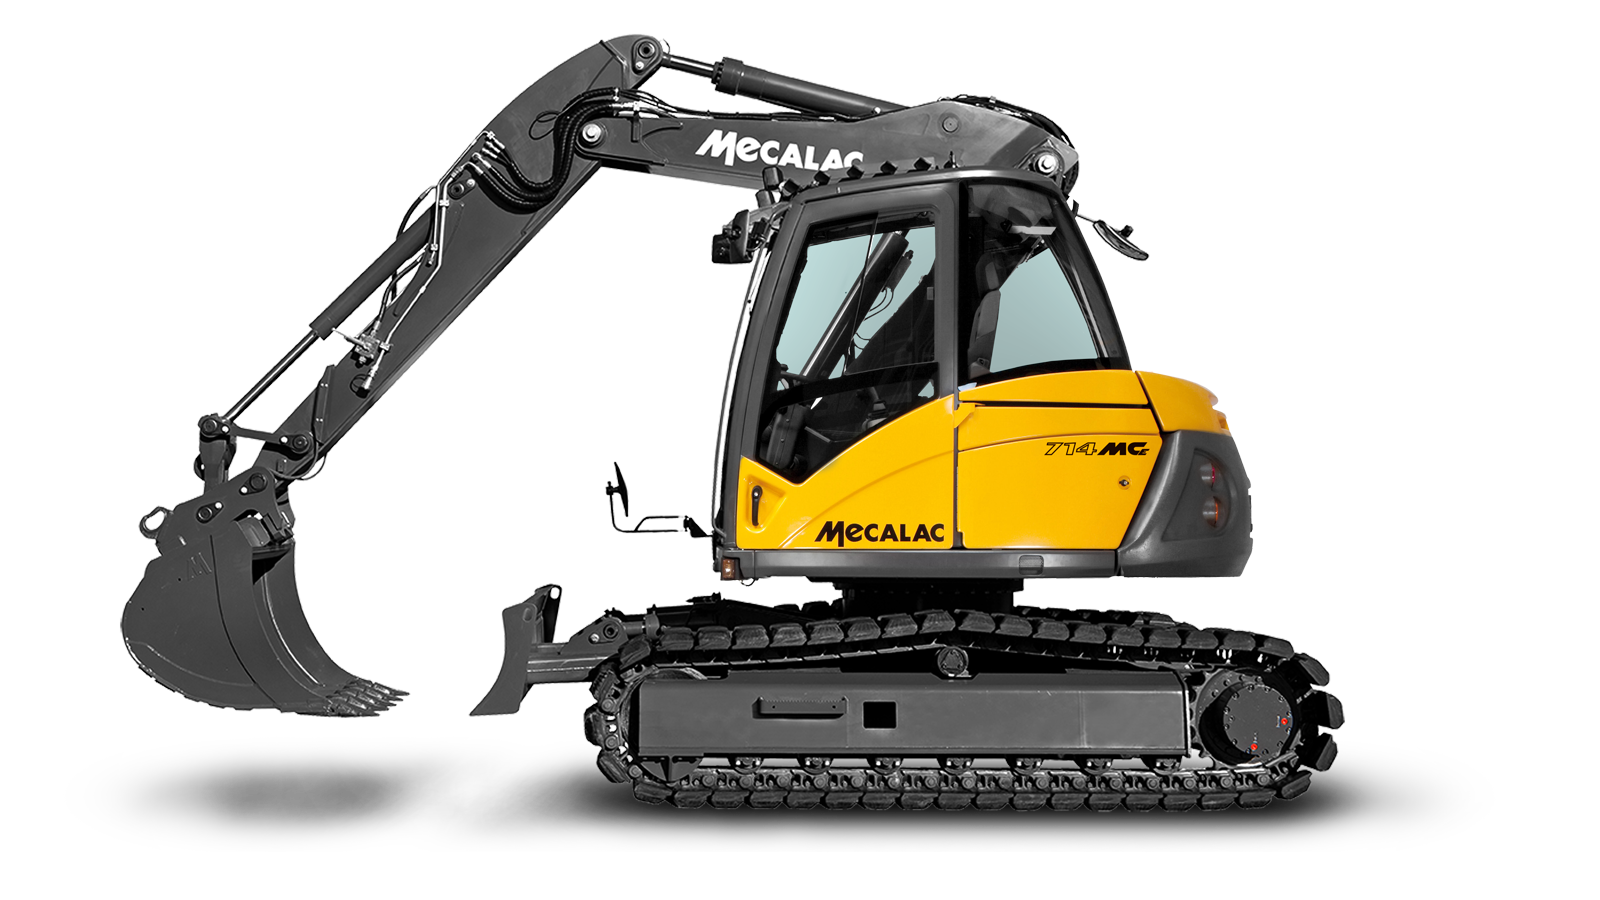 Crawler Excavator Mecalac 714mce